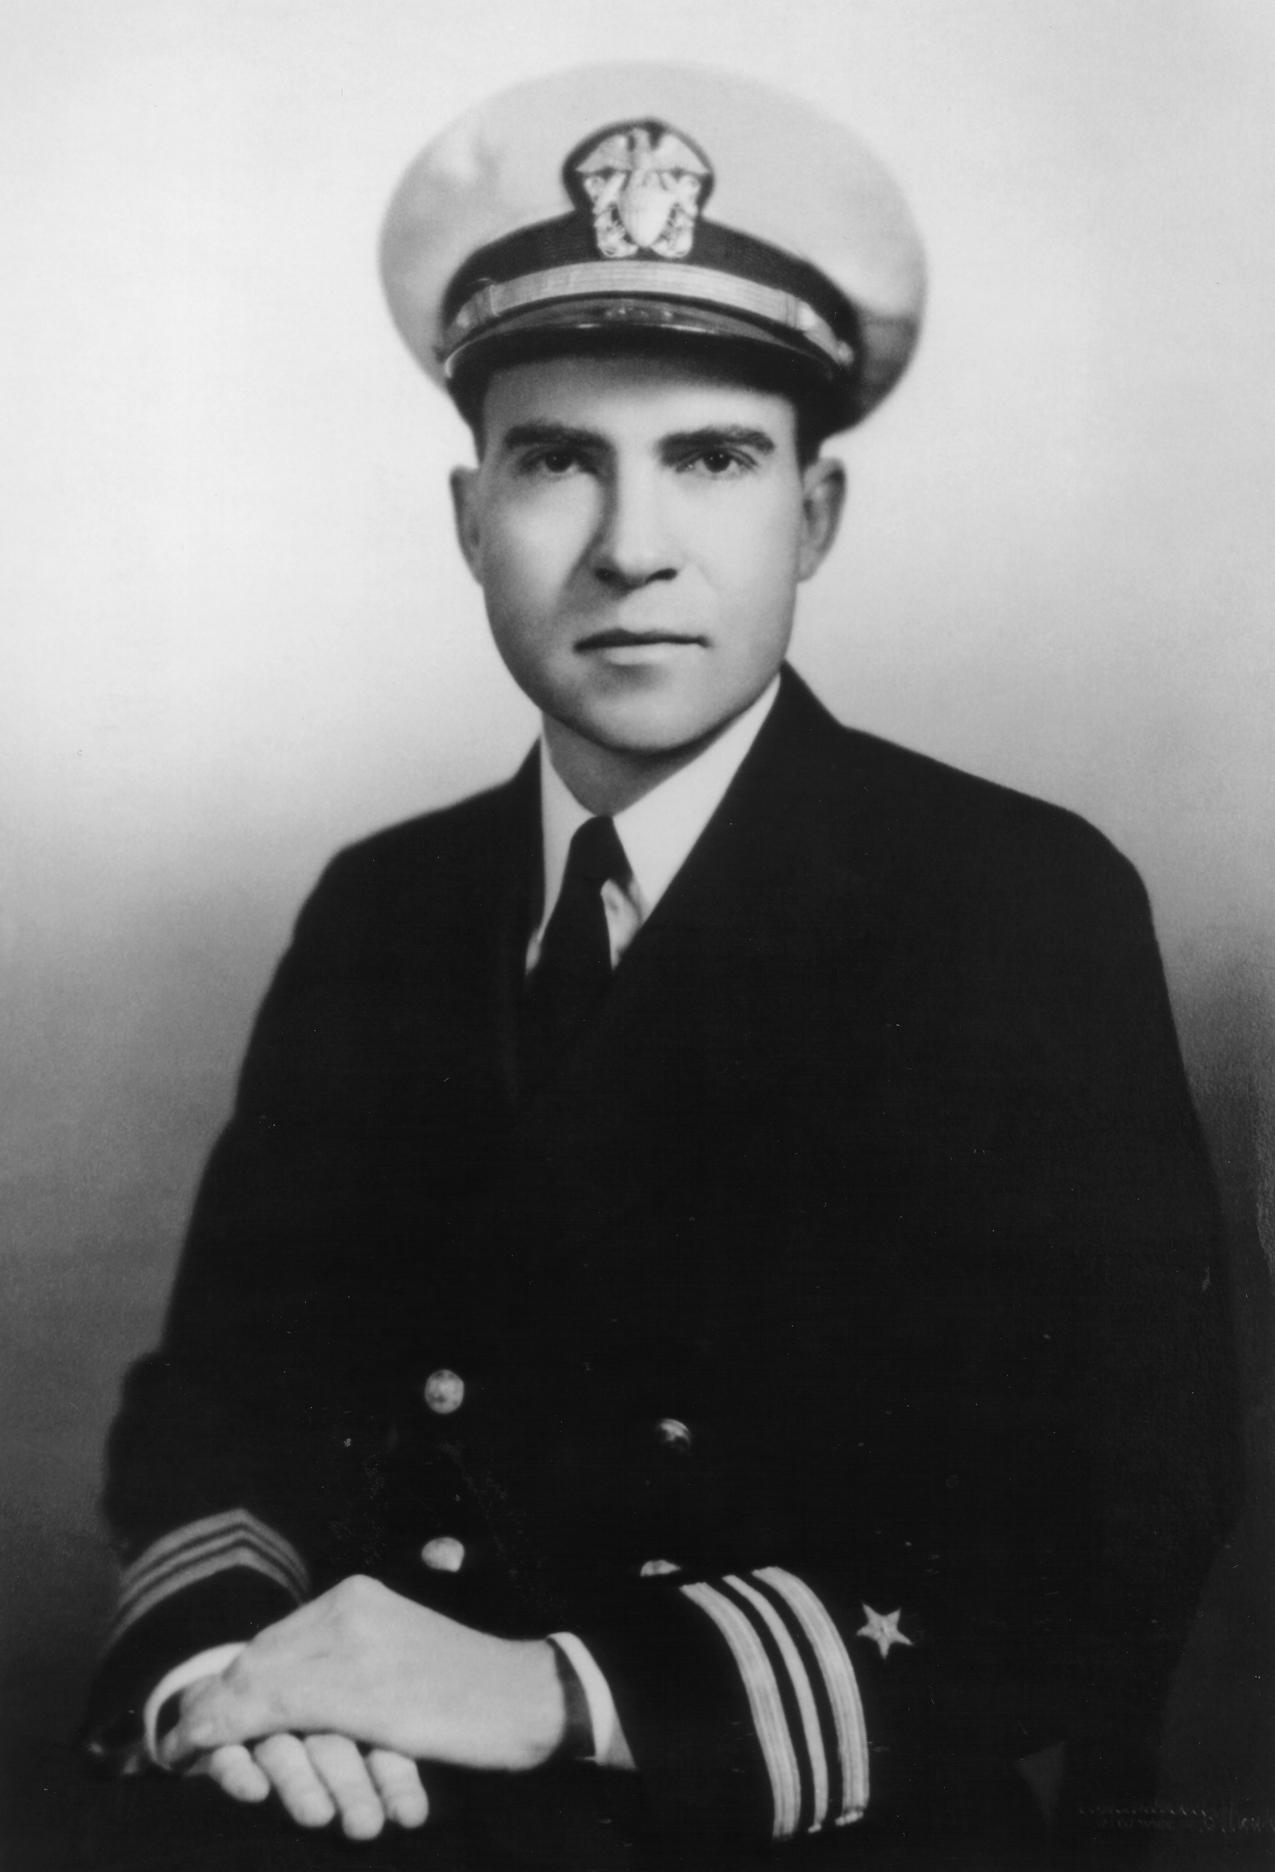 Lieutenant Commander Richard Nixon of the Unit...